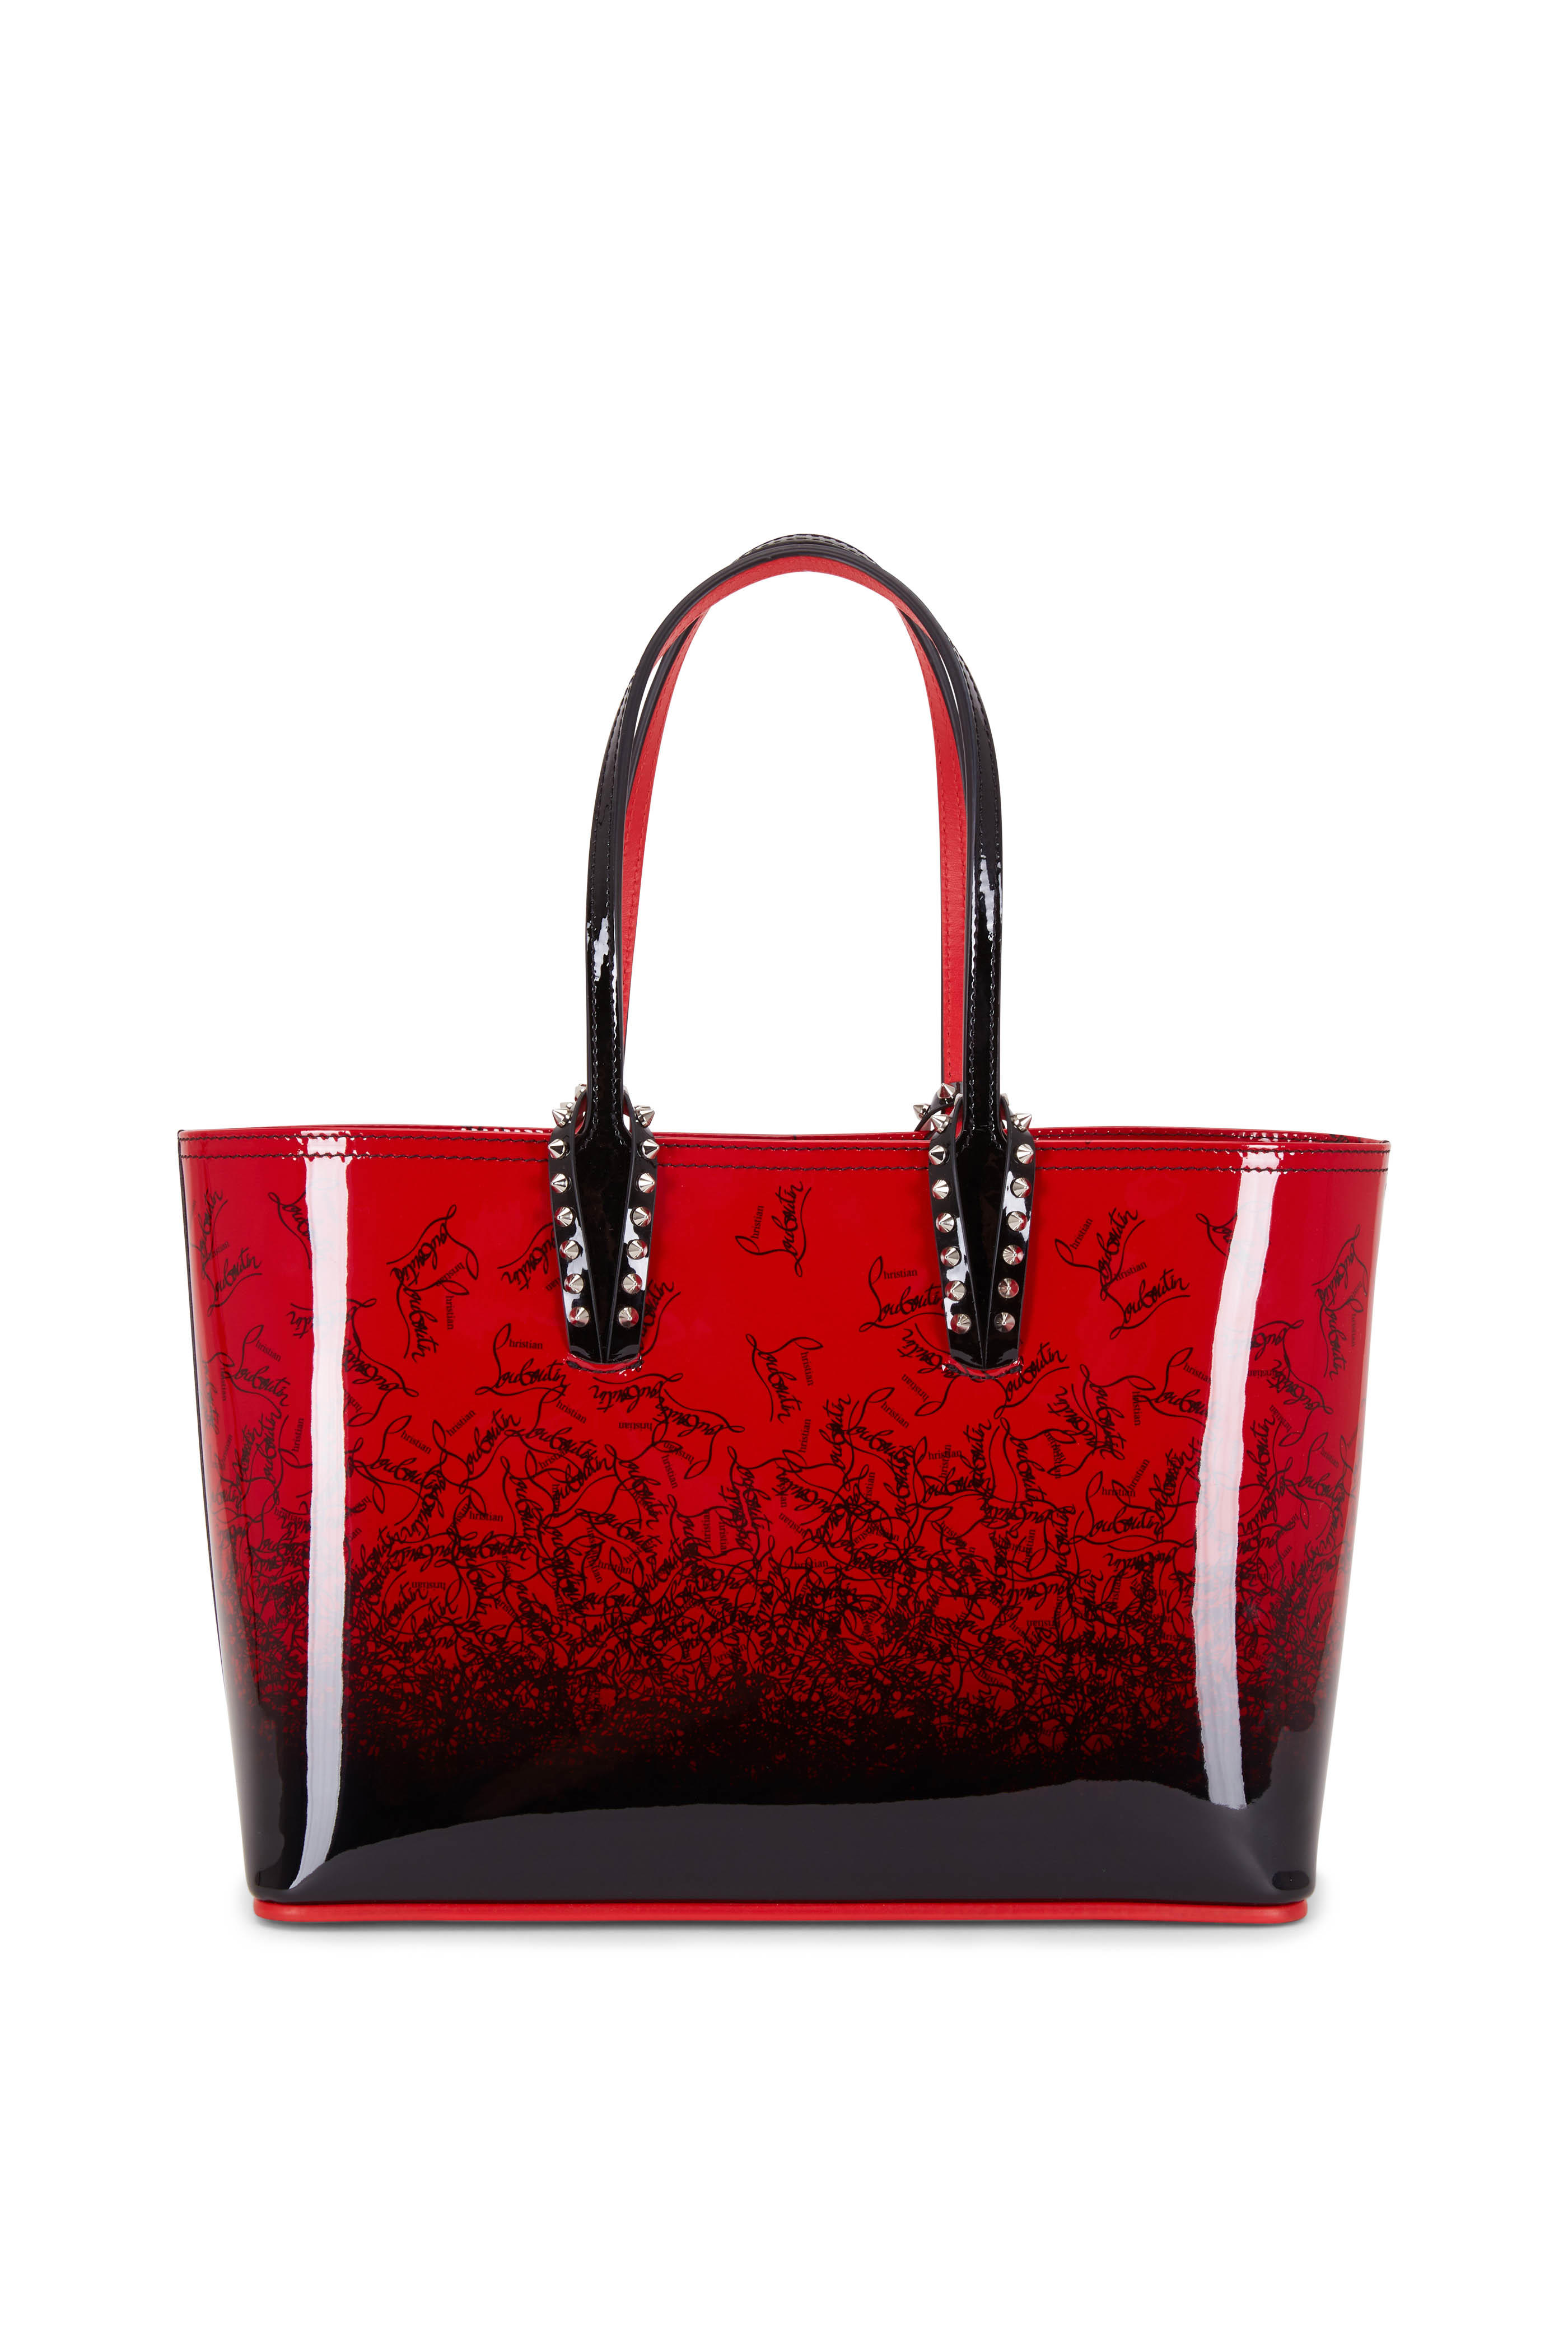 8762e16cf52 Christian Louboutin - Cabata Red & Black Patent Small Tote ...